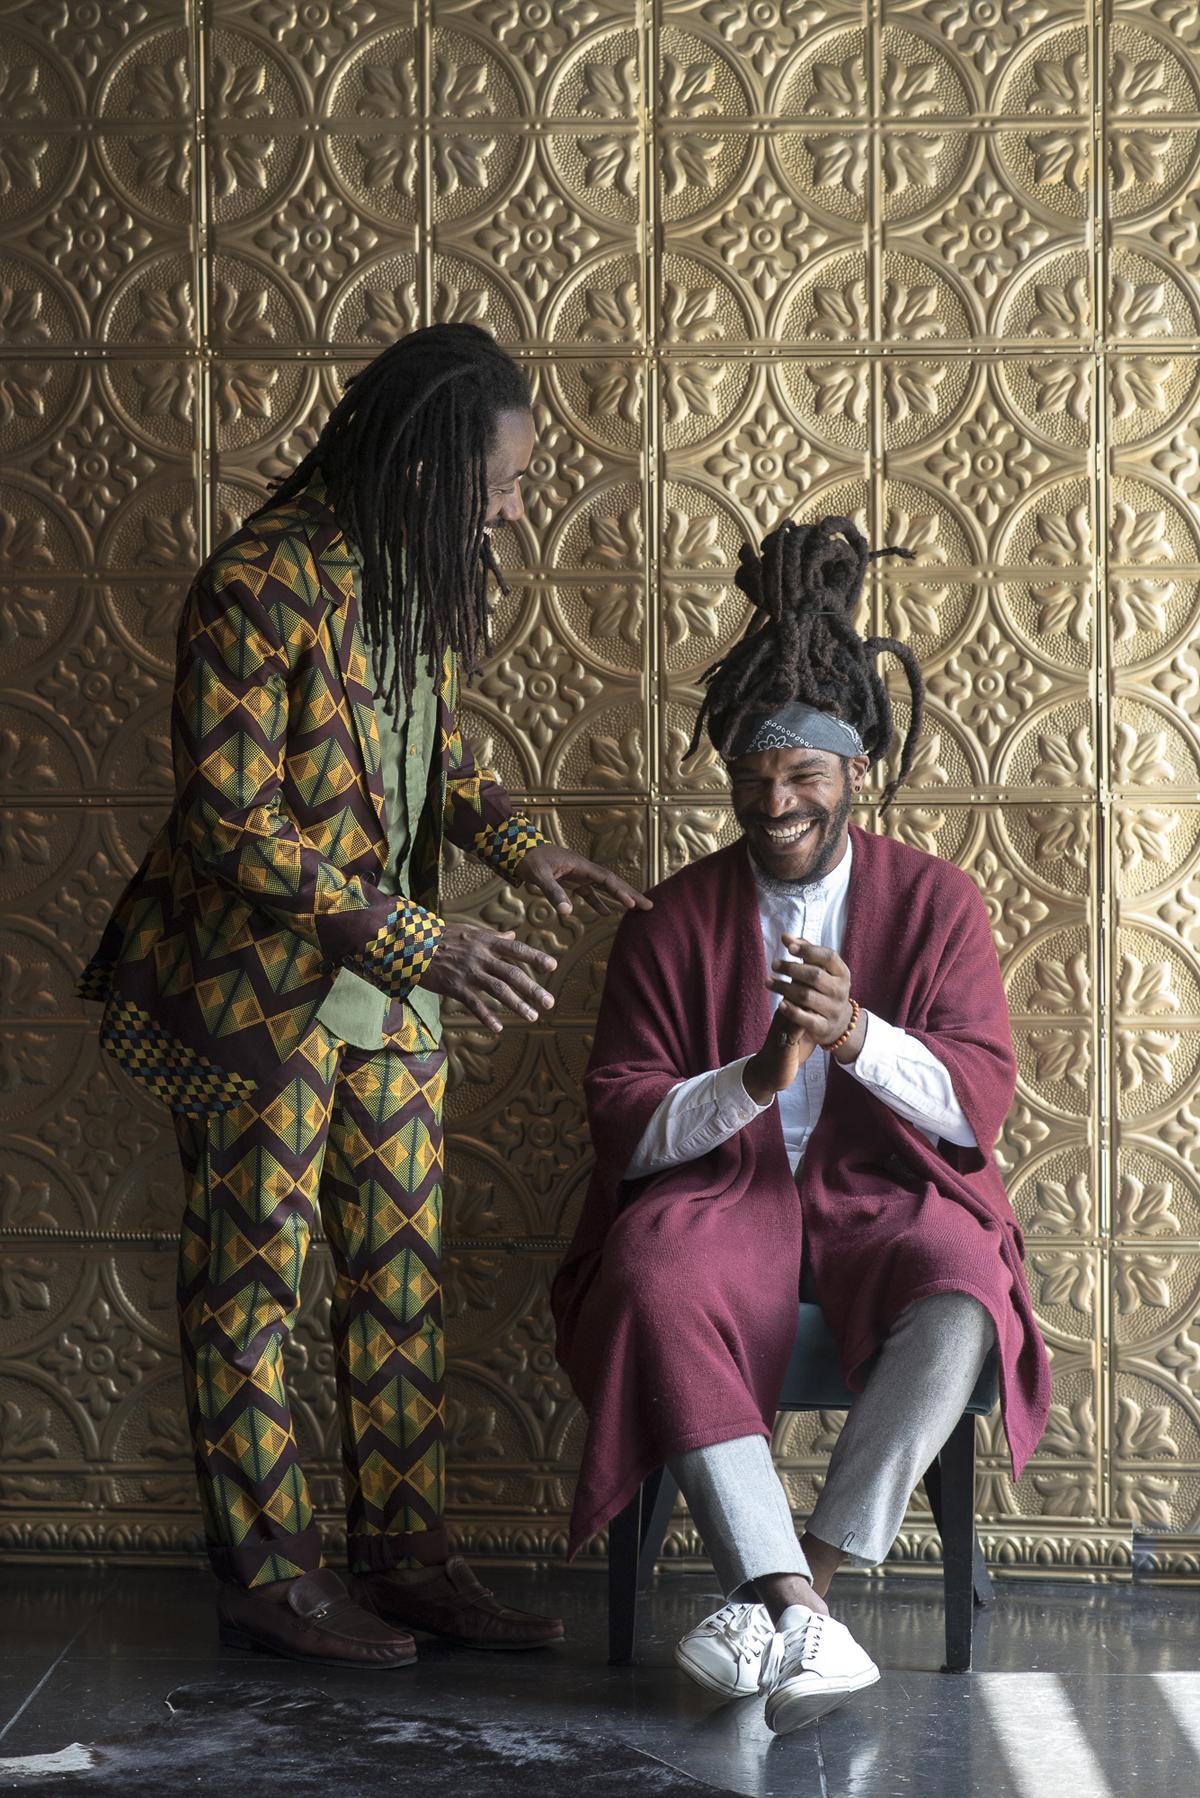 Black-men-smile-islandboi0023.jpg